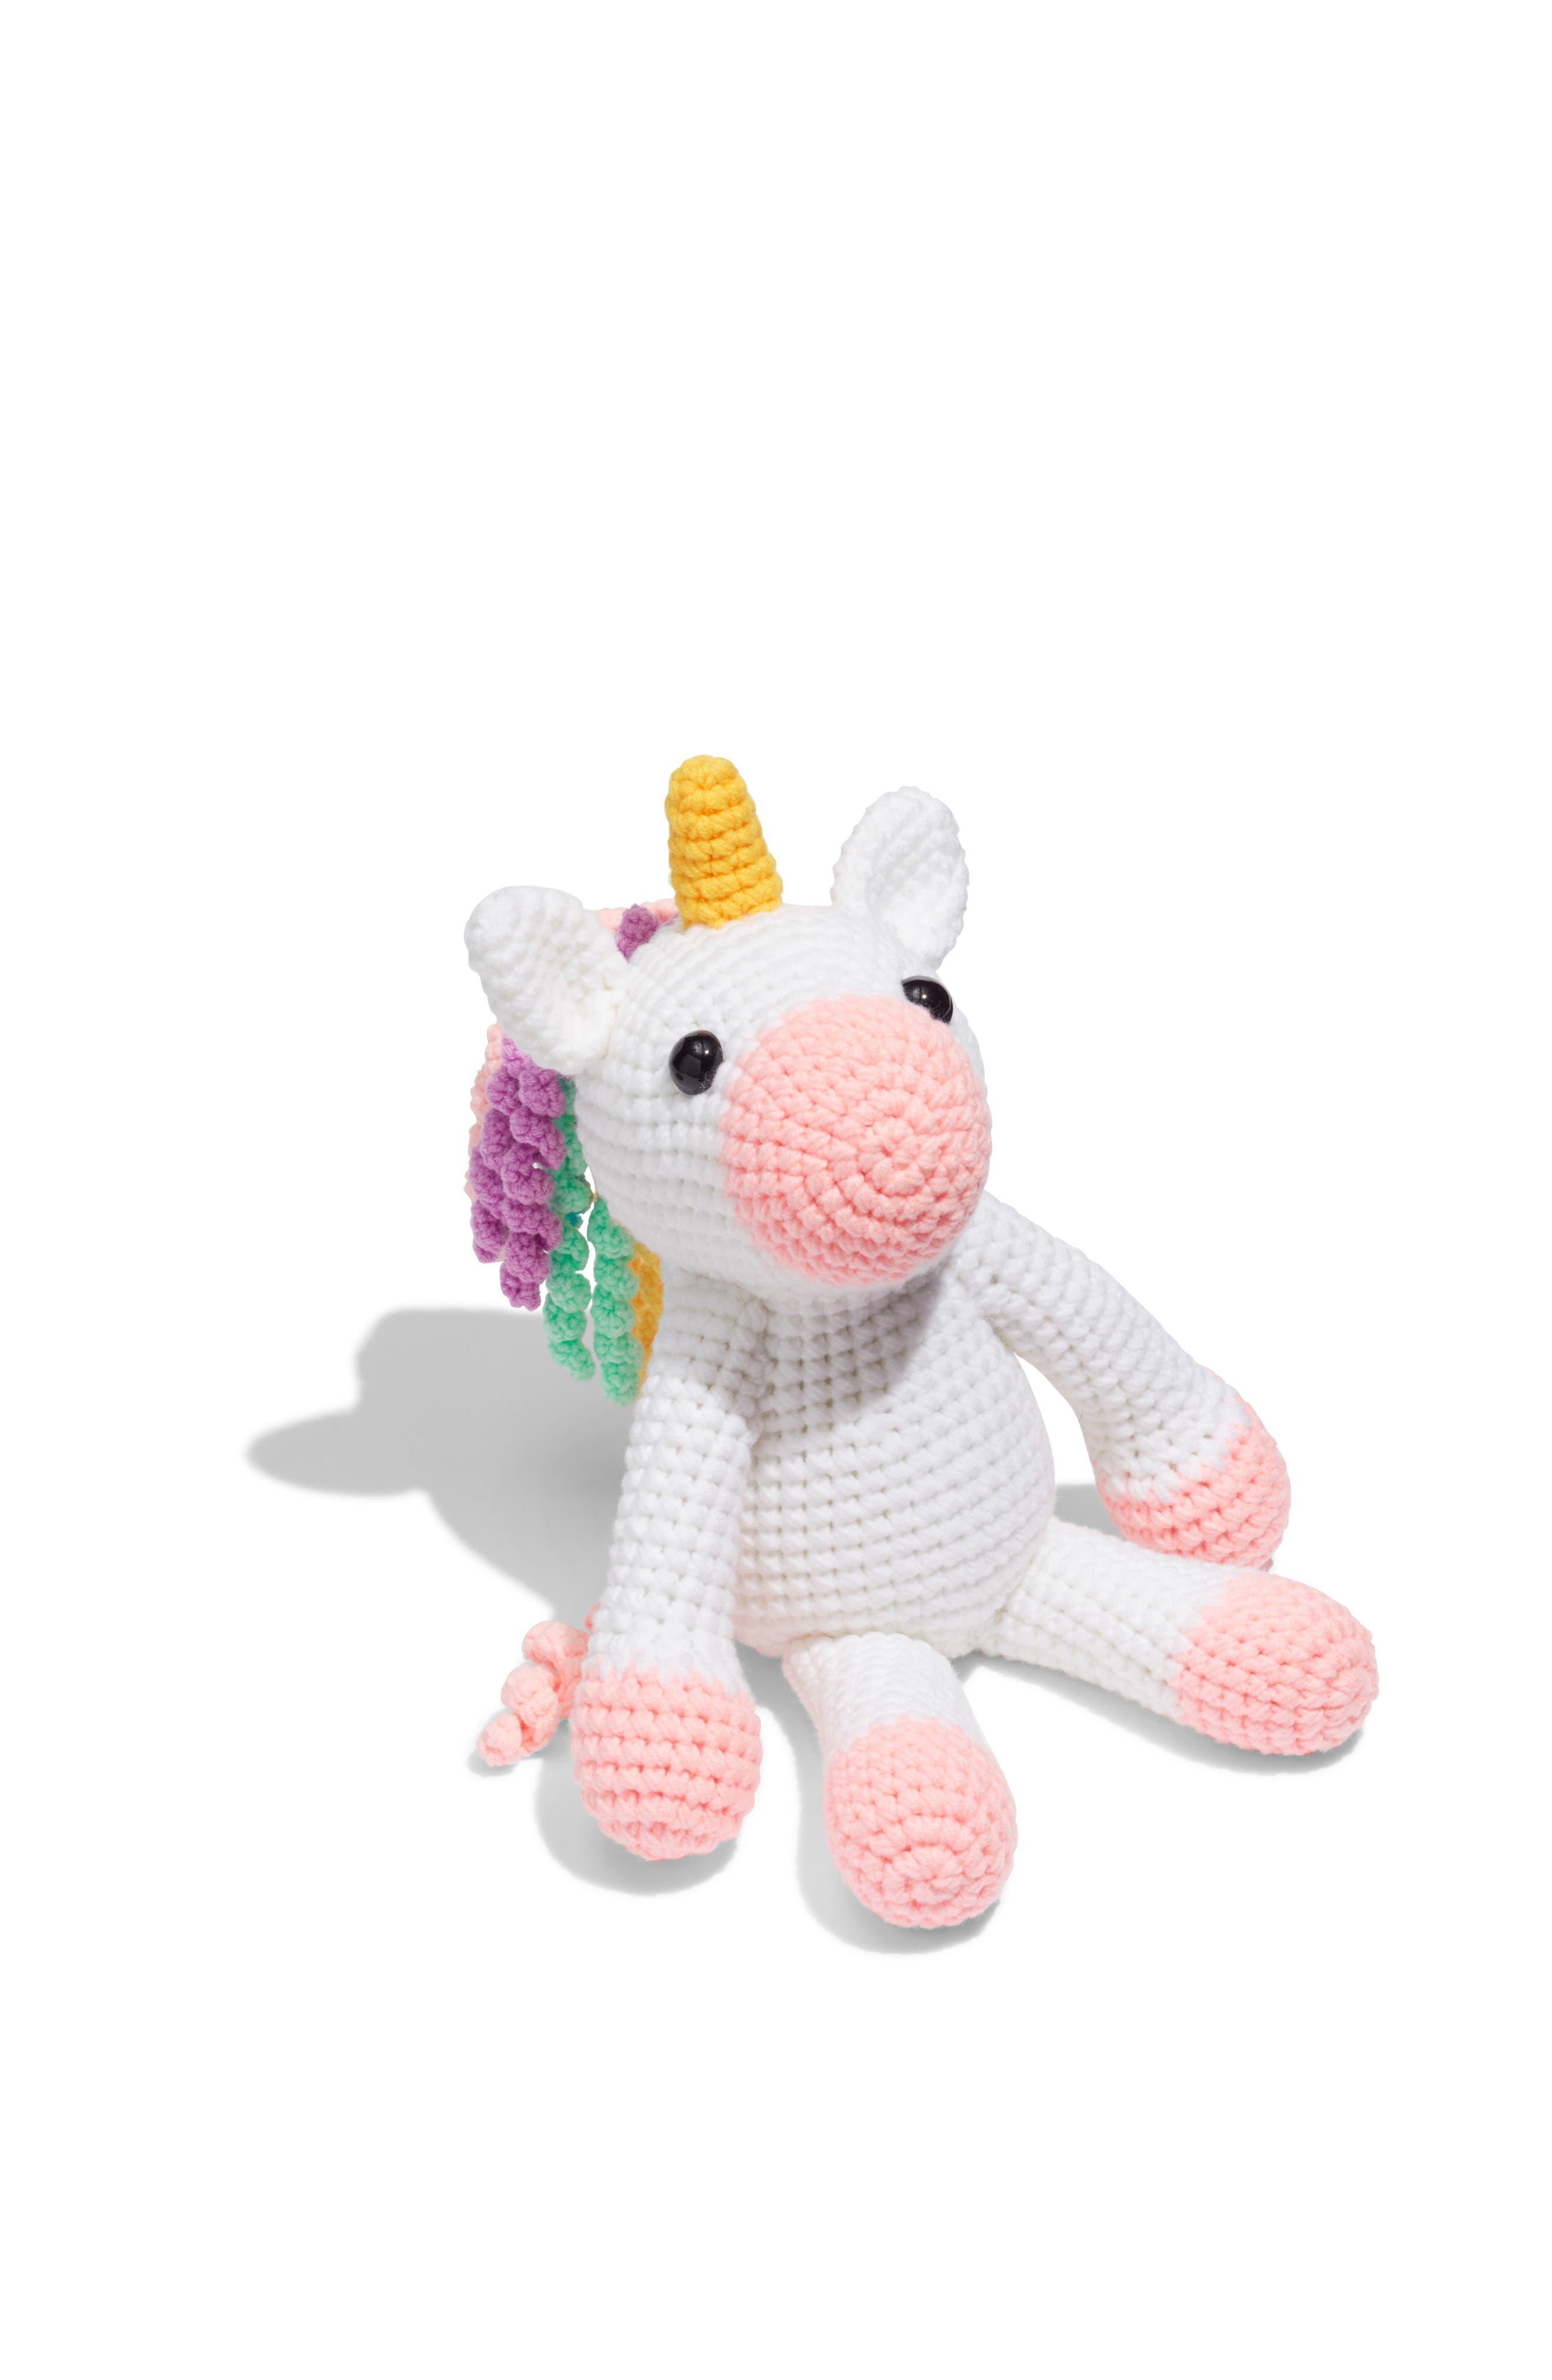 Twinks Crochet Unicorn Doll,                             Main thumbnail 1, color,                             WHITE/ MULTI